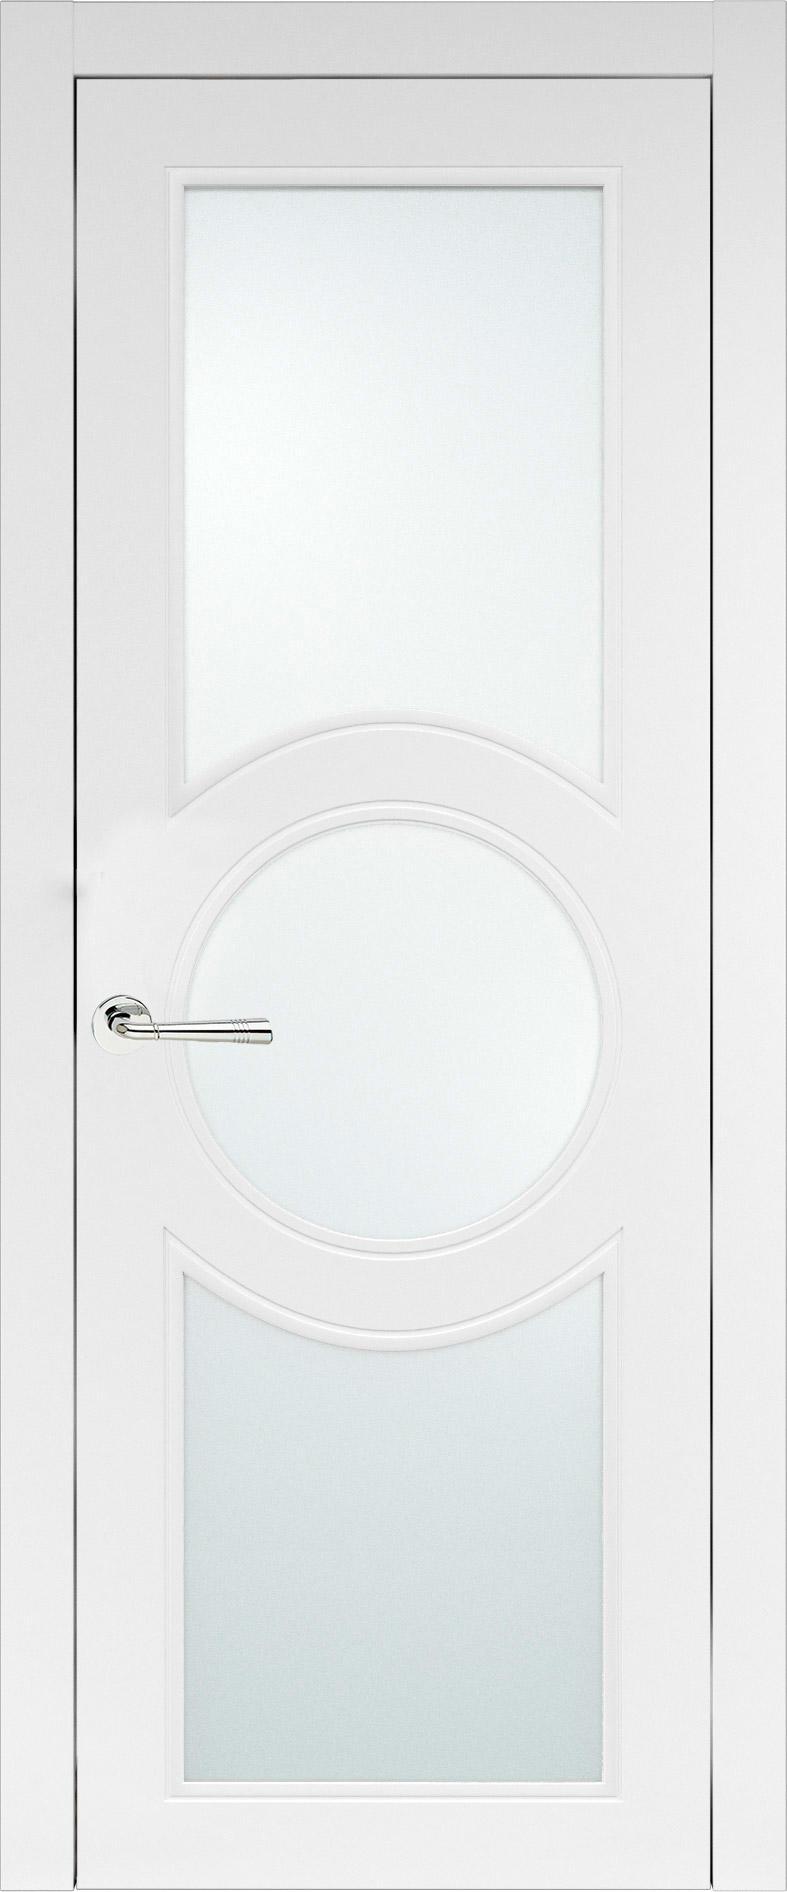 Ravenna Neo Classic цвет - Белая эмаль (RAL 9003) Со стеклом (ДО)